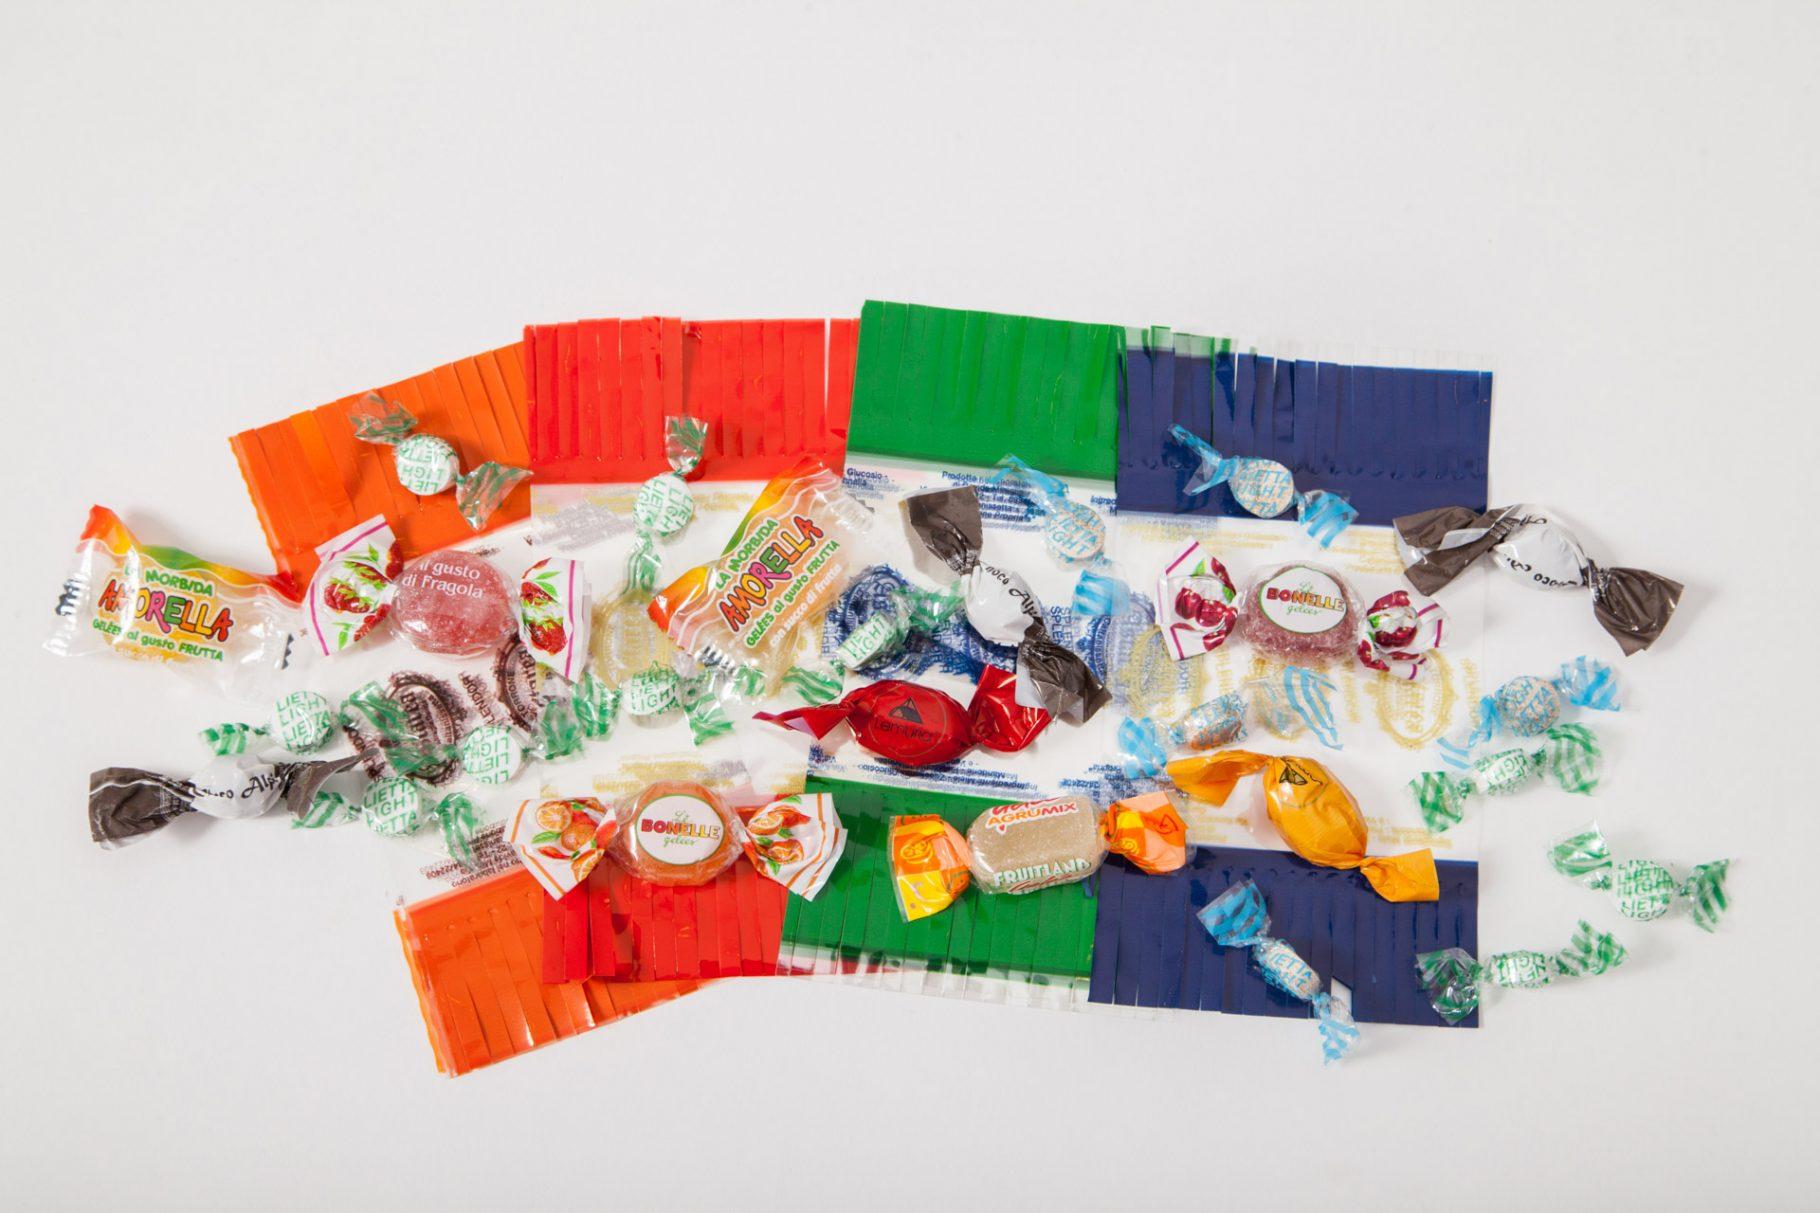 celvil-packaging-e-incarti-per-dolciumi-e-caramelle